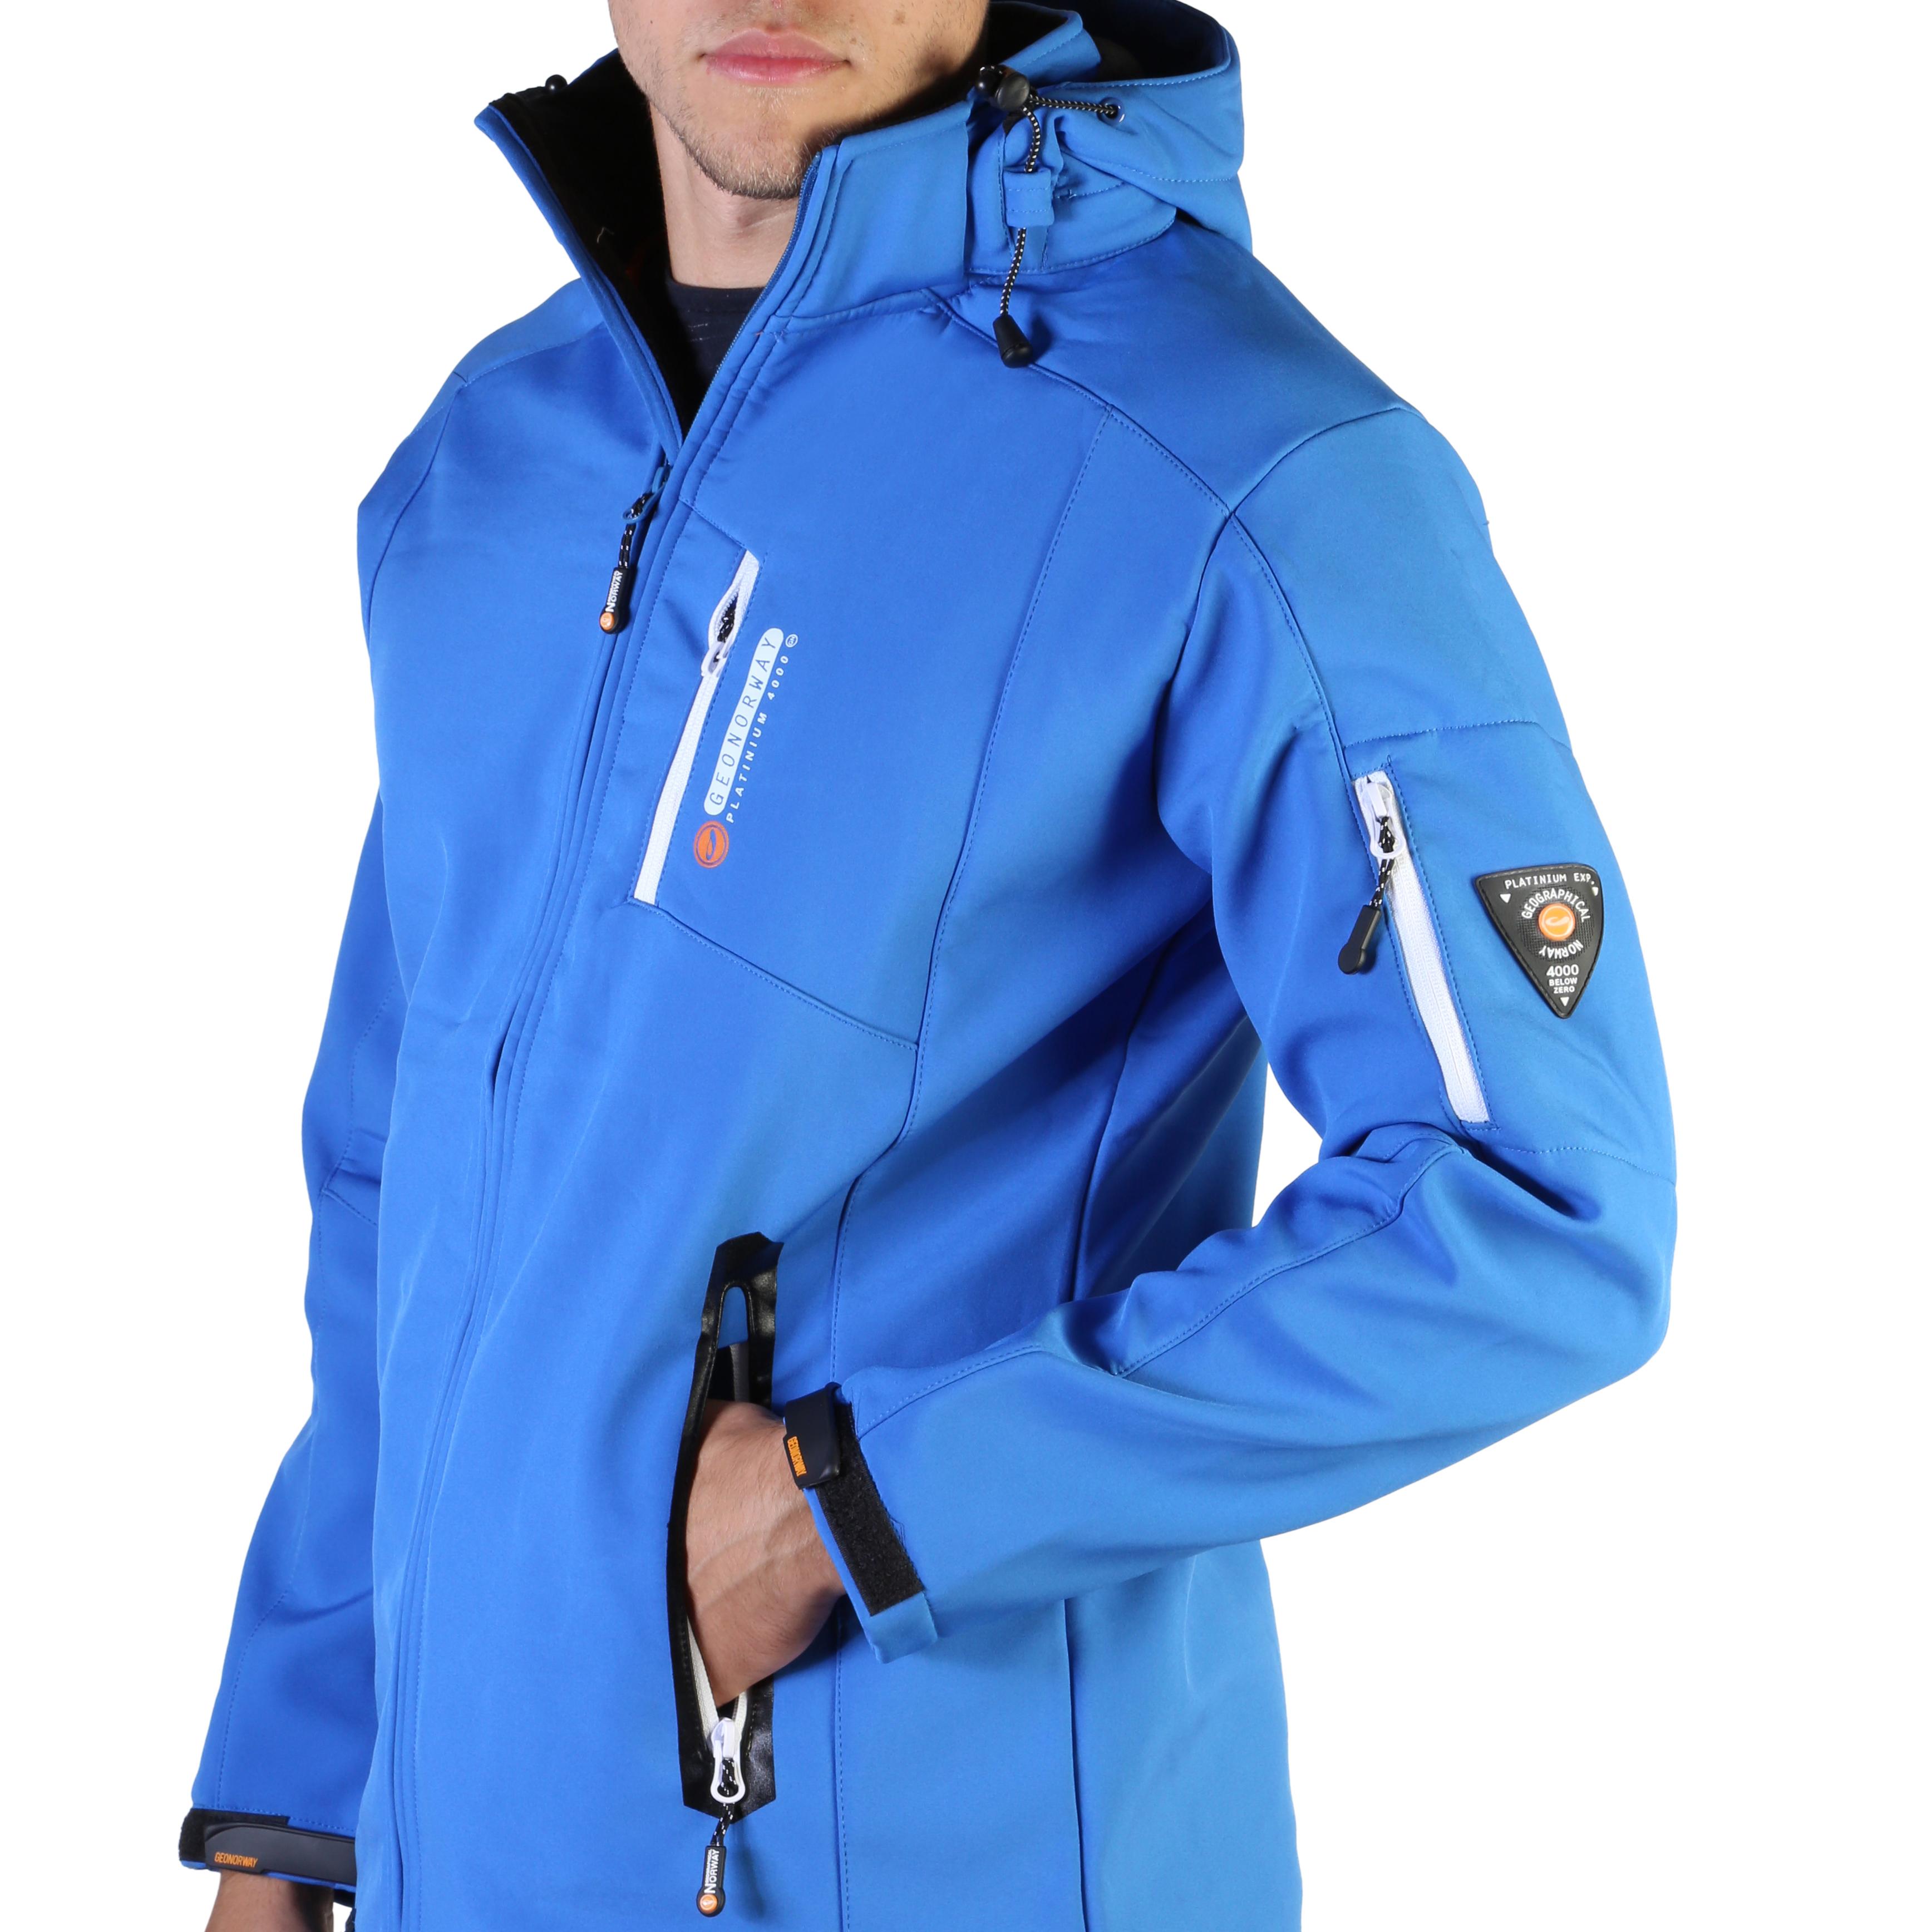 Vestes & blousons  Geographical norway Tichri_manTichri_man_blue blue